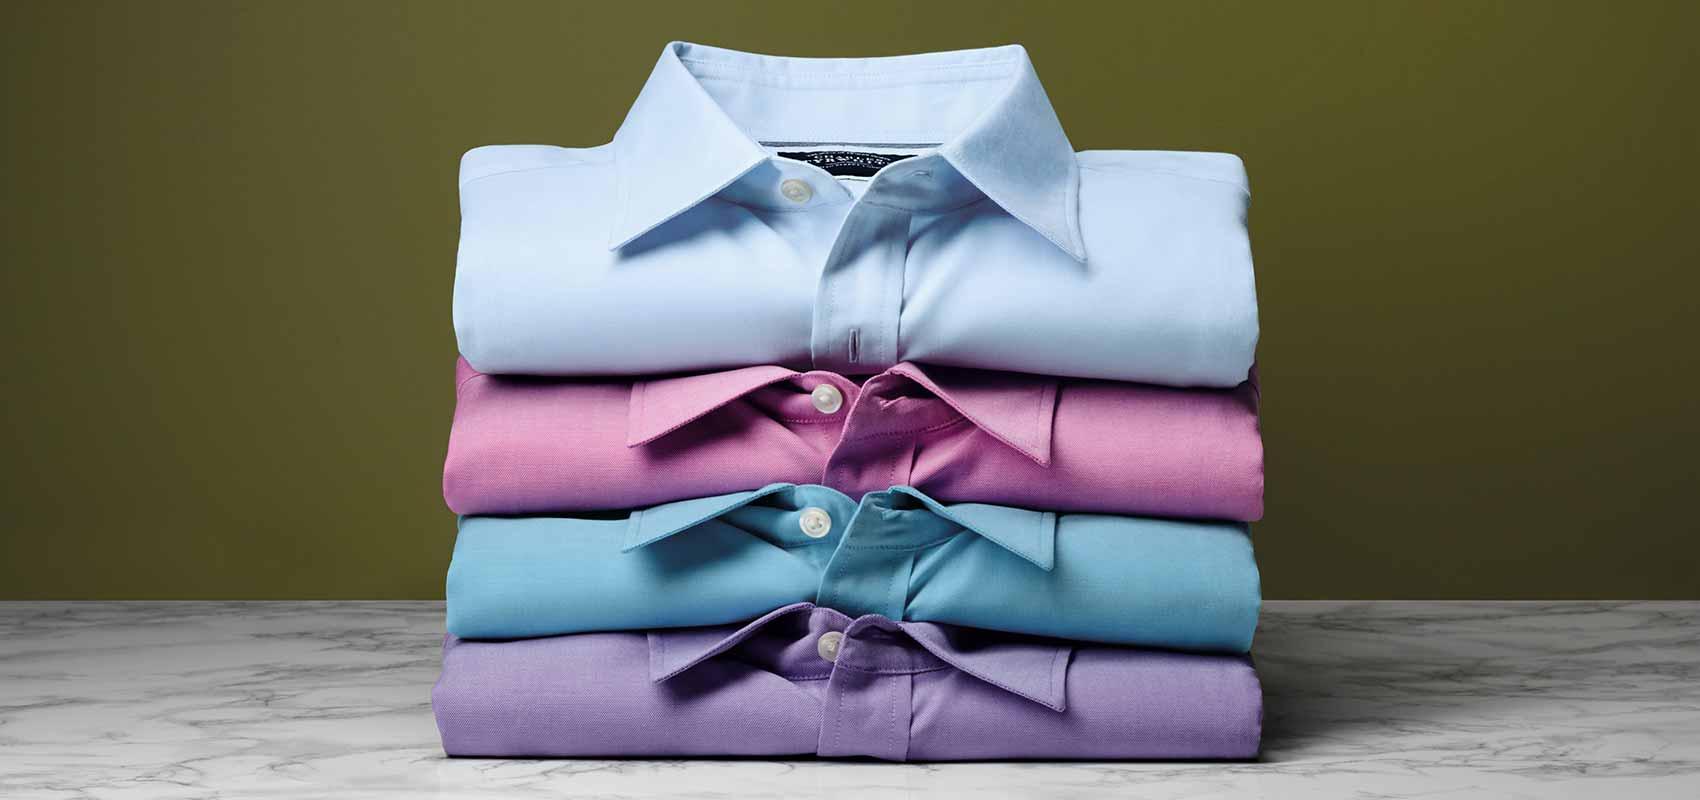 Charles Tyrwhitt Oxford weave shirts